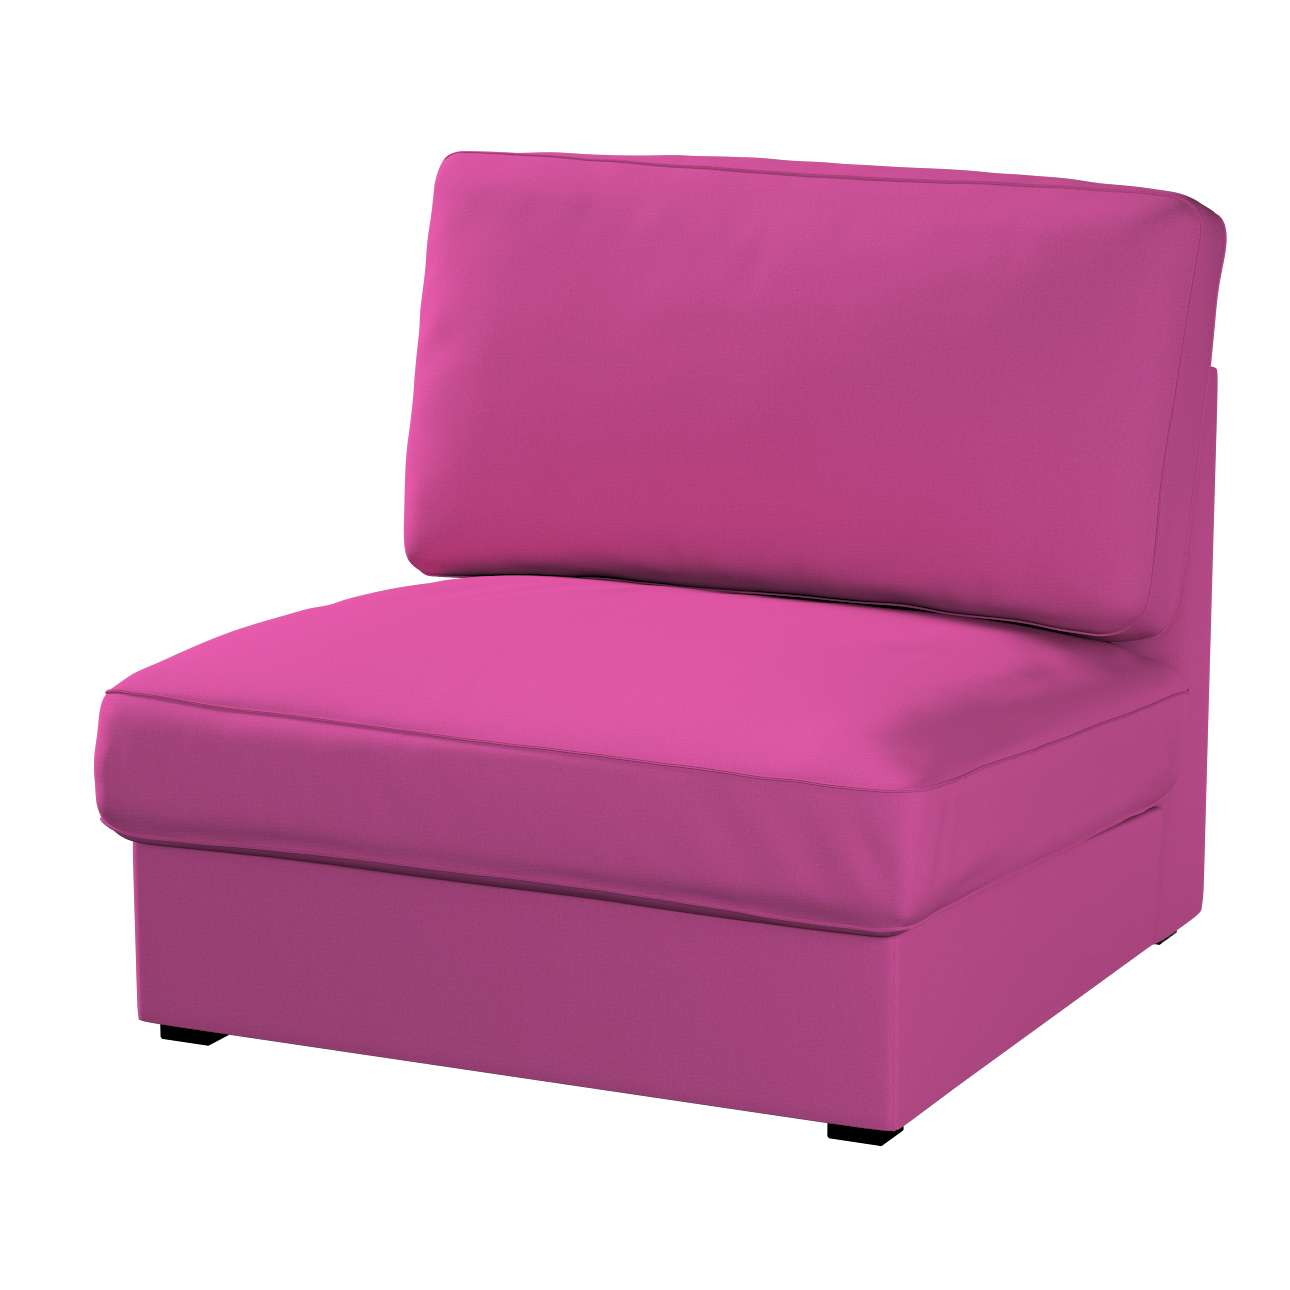 Pokrowiec na fotel Kivik Fotel Kivik w kolekcji Etna , tkanina: 705-23